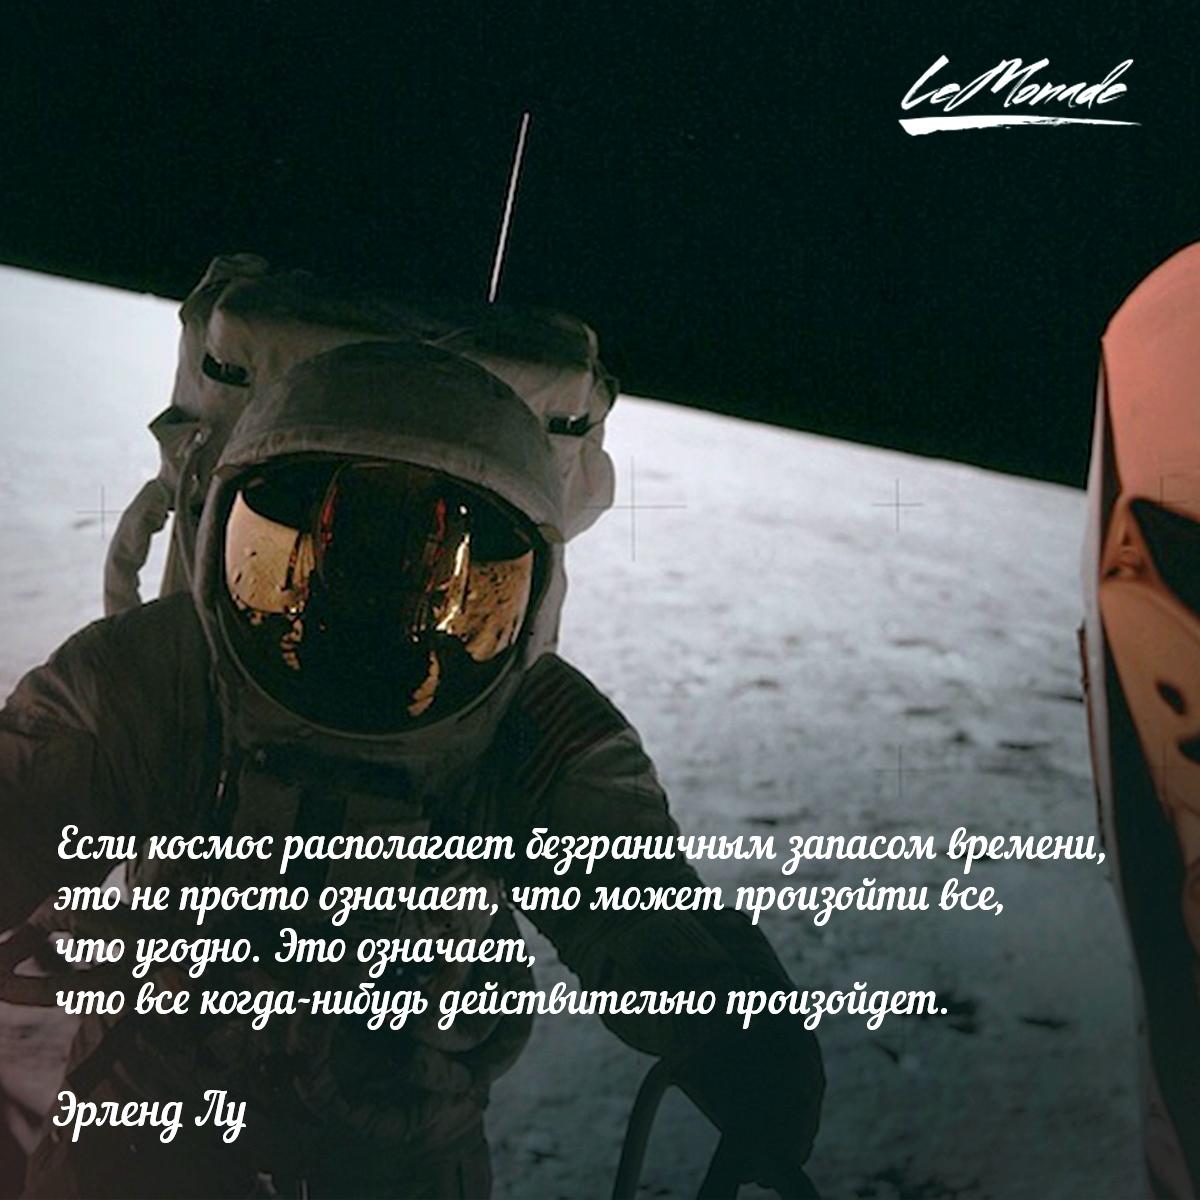 фото космоса с цитатами ещё металлоискатель